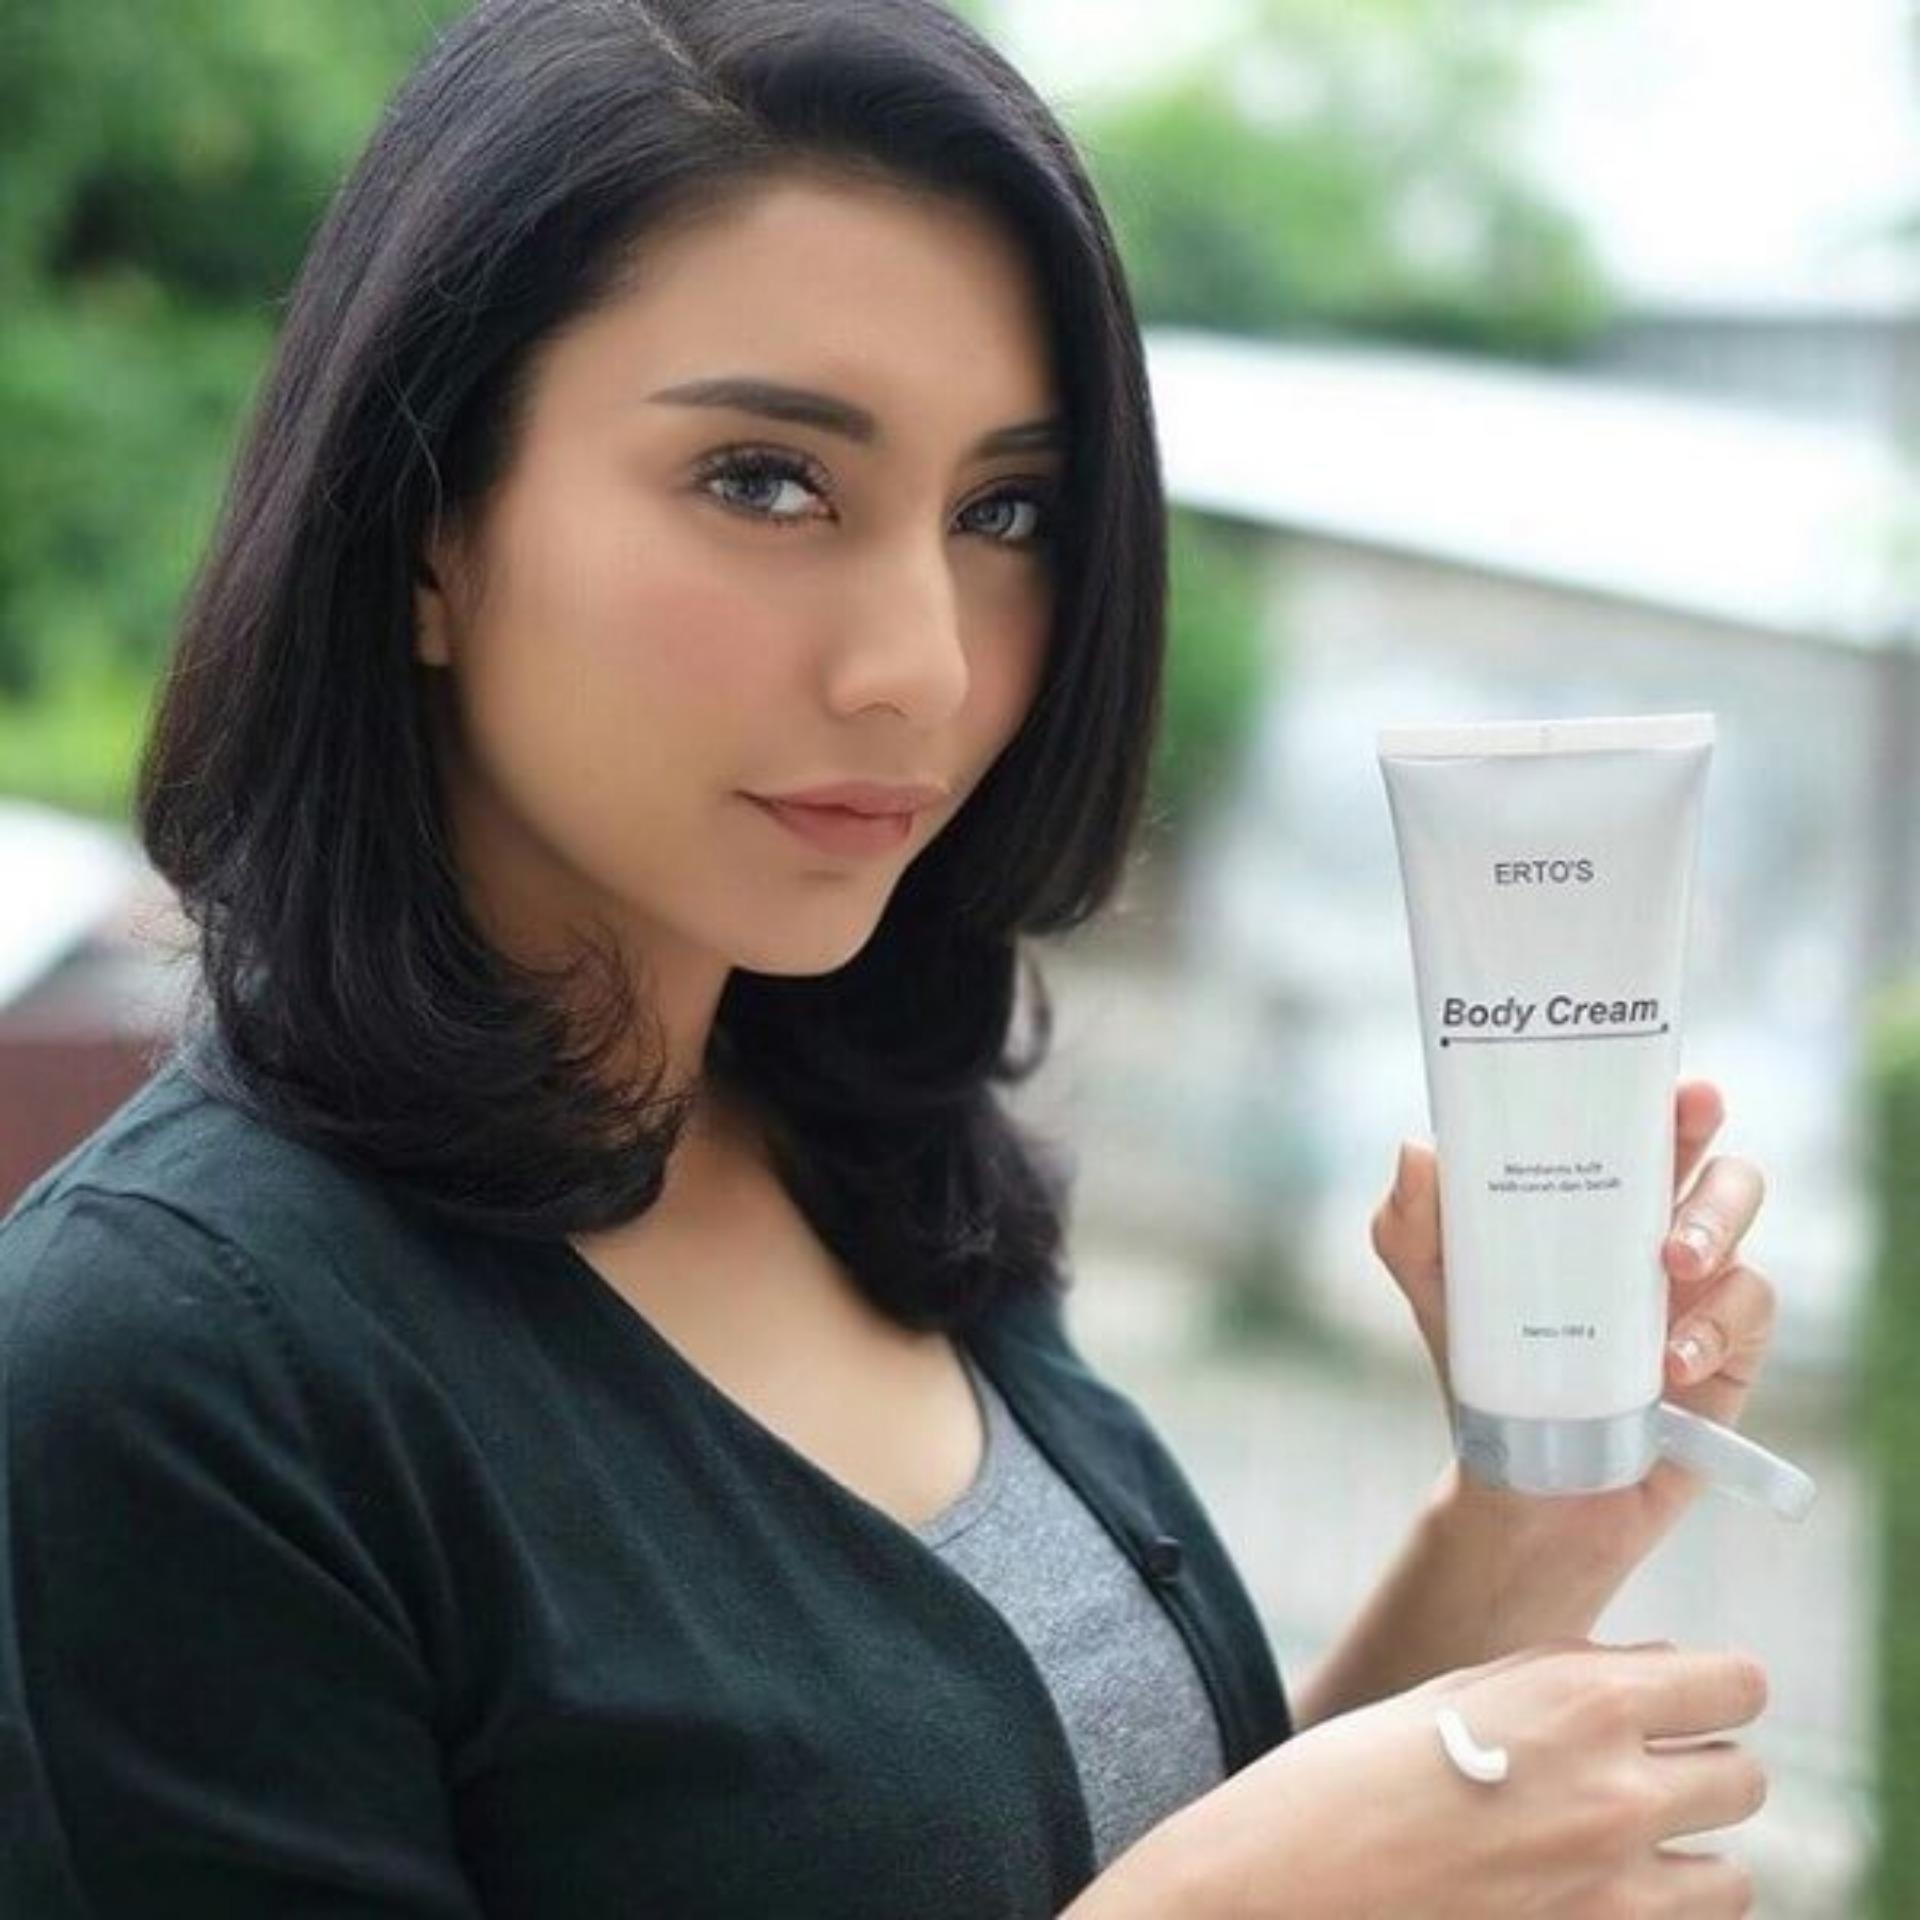 Murah Ertos Body Cream Whitening Lotion Krim Pemutih Badan Bibit Bpom Original Skincare